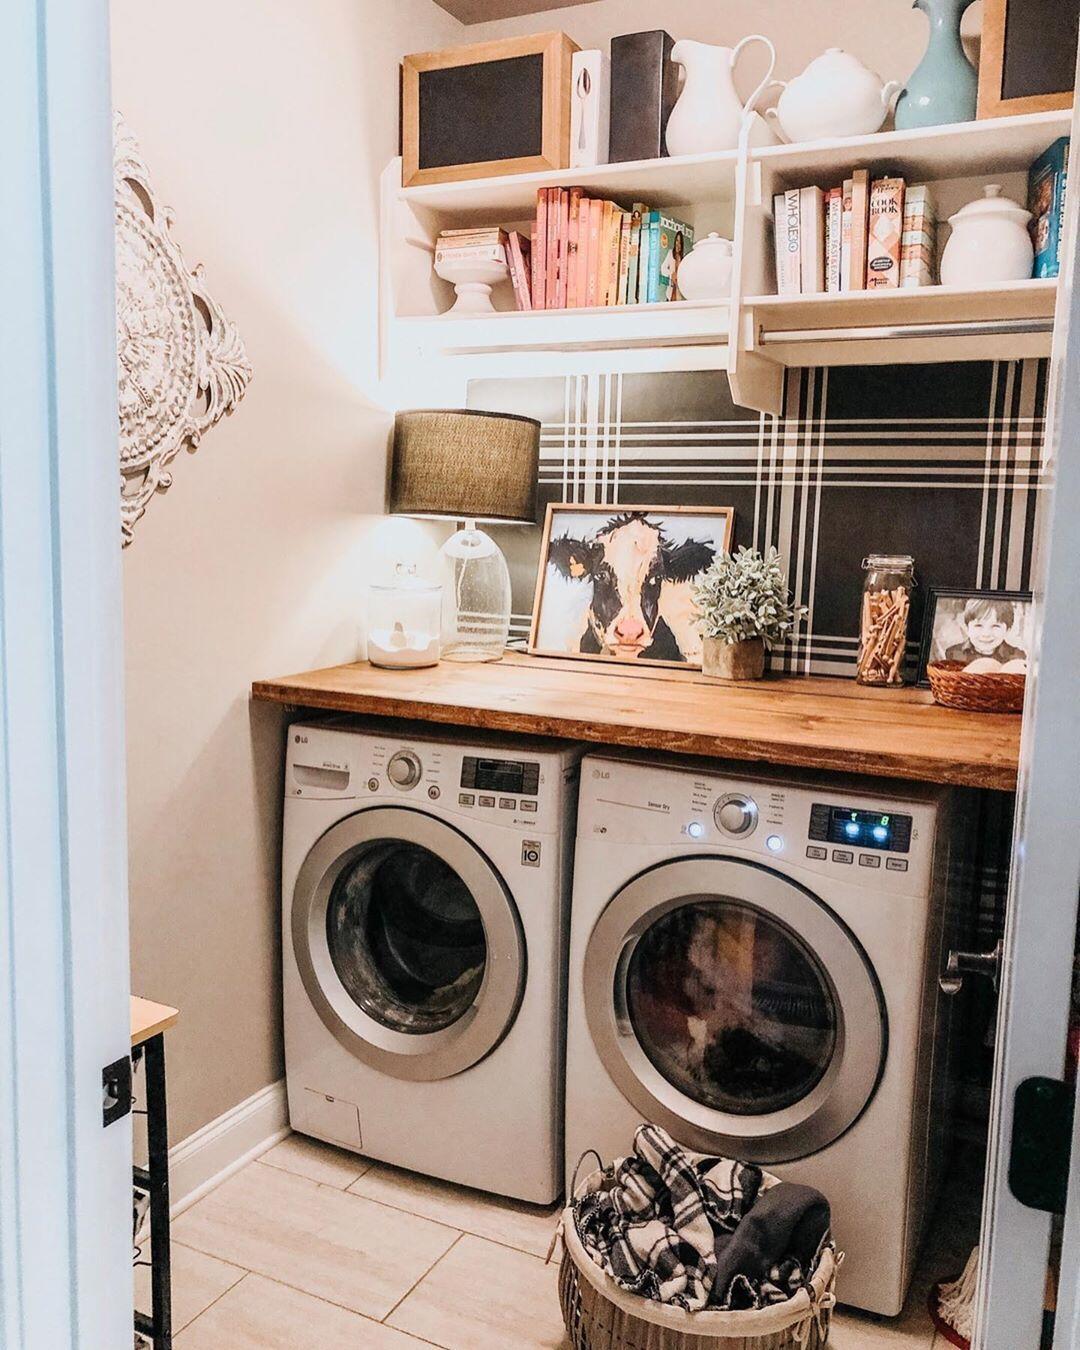 Budget Laundry Room Makeover Budget Laundry Room Makeover